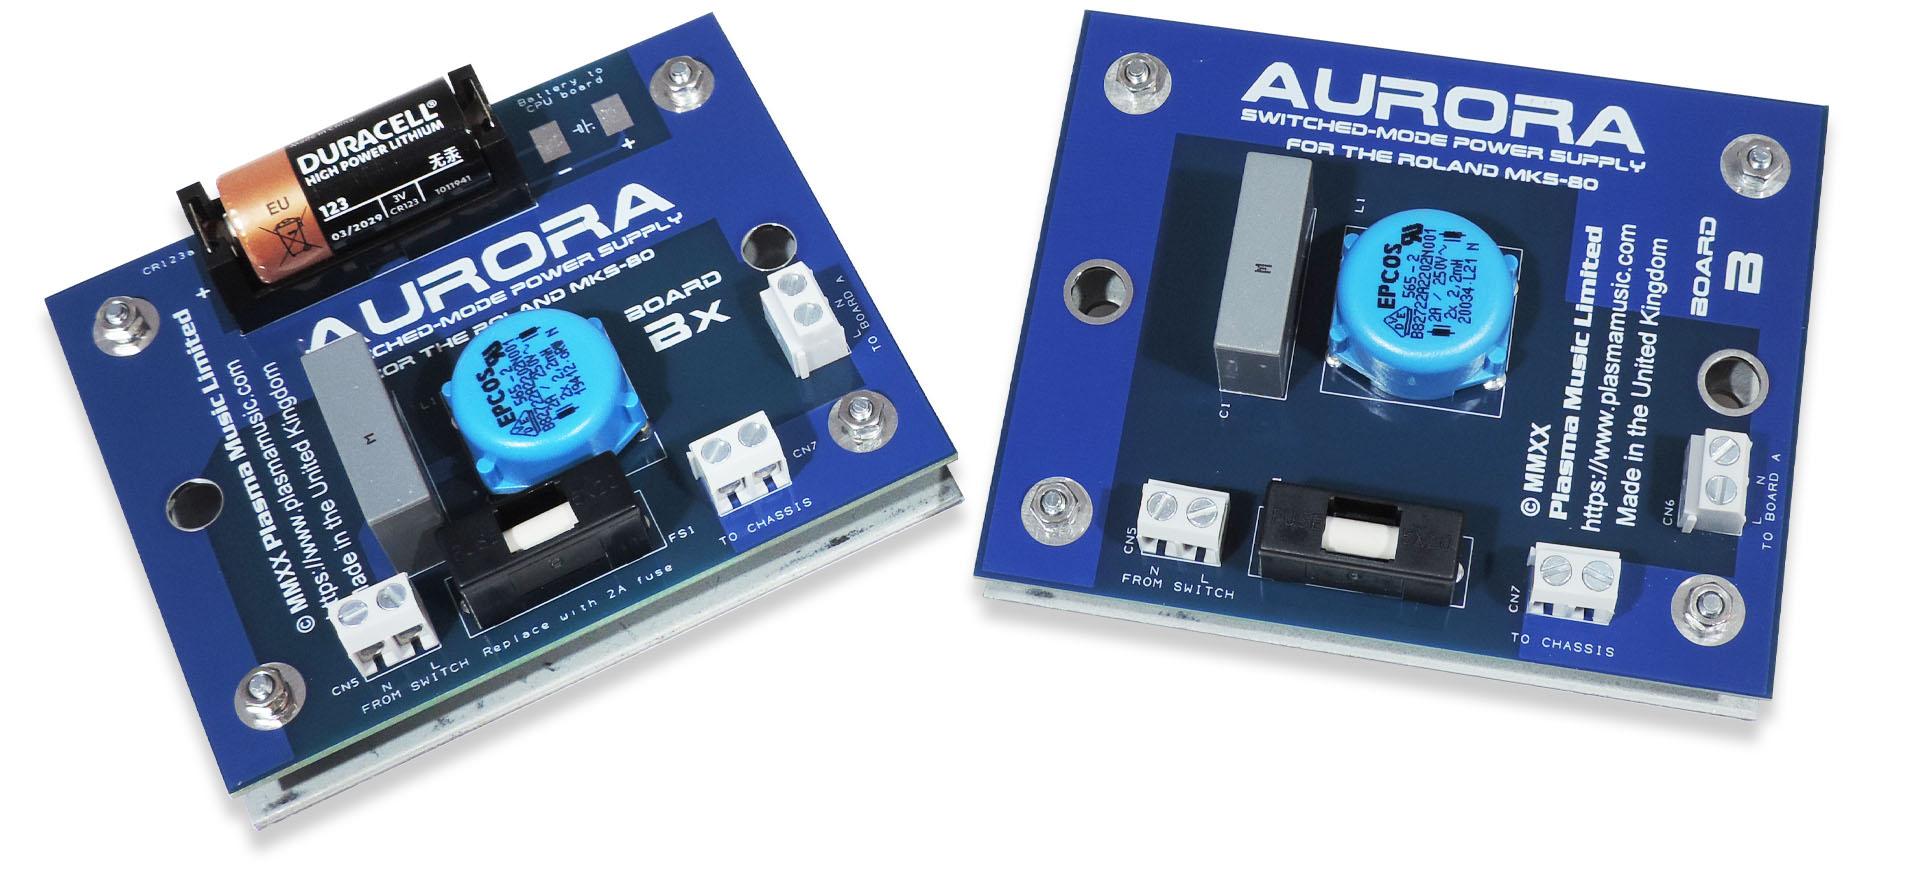 Aurora Board B and new Board Bx 2